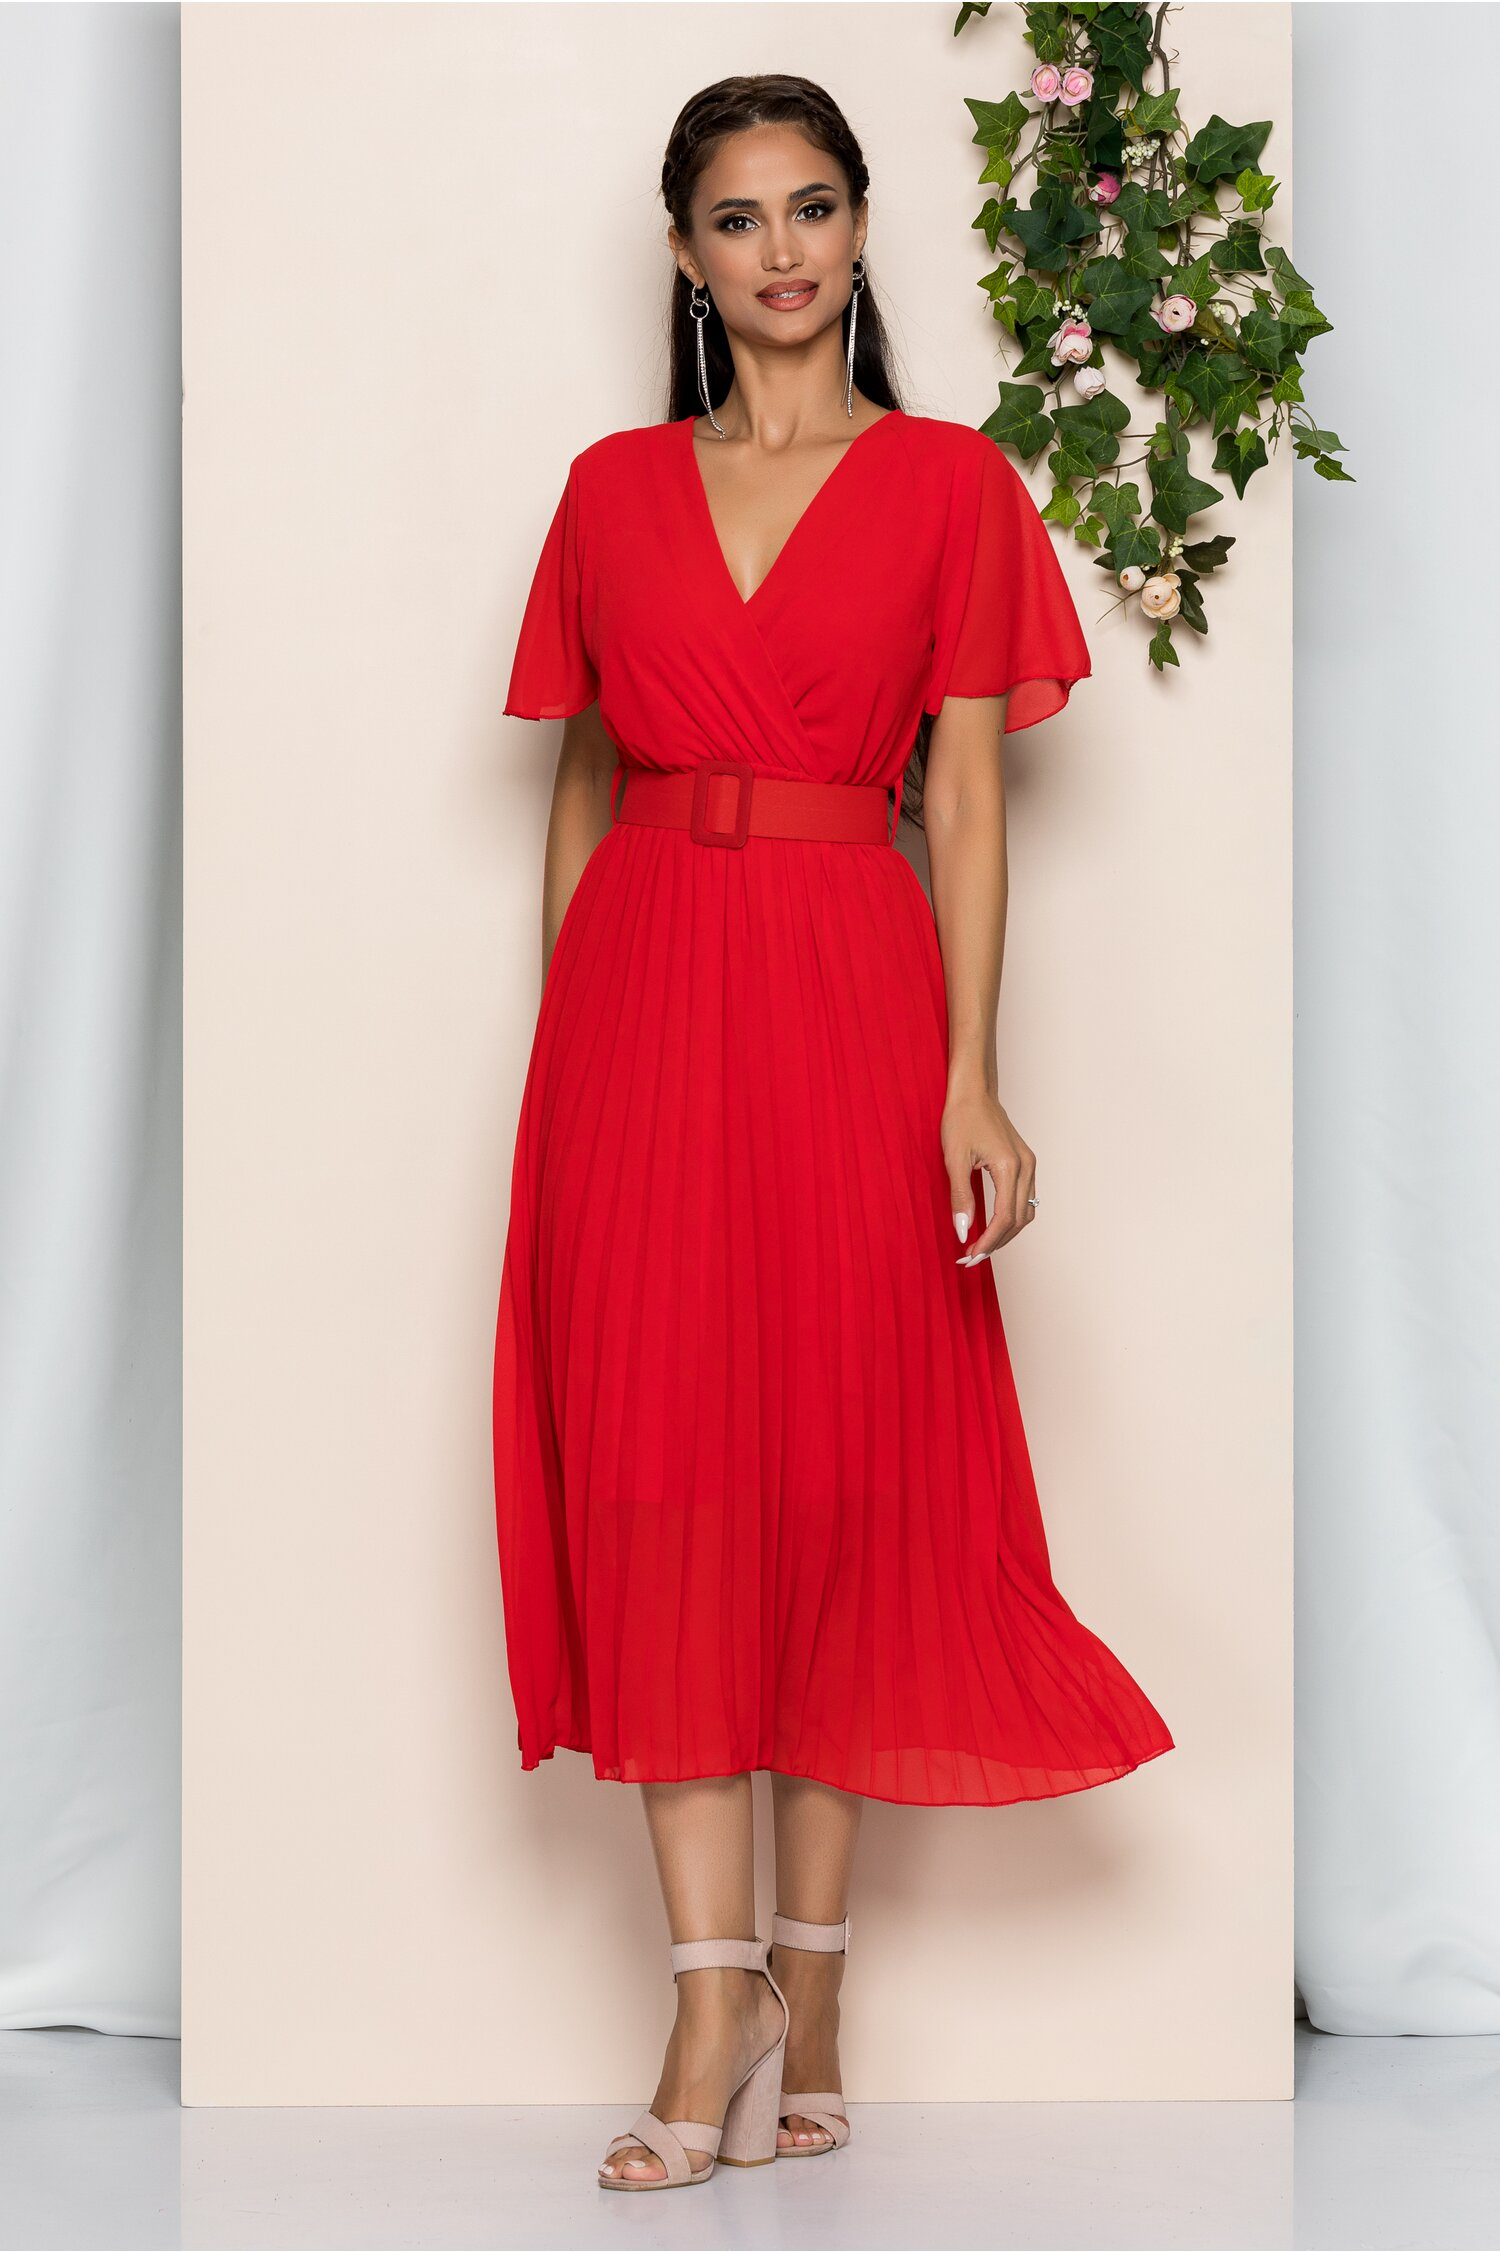 Rochie Kamelia rosie cu pliuri pe fusta si curea in talie